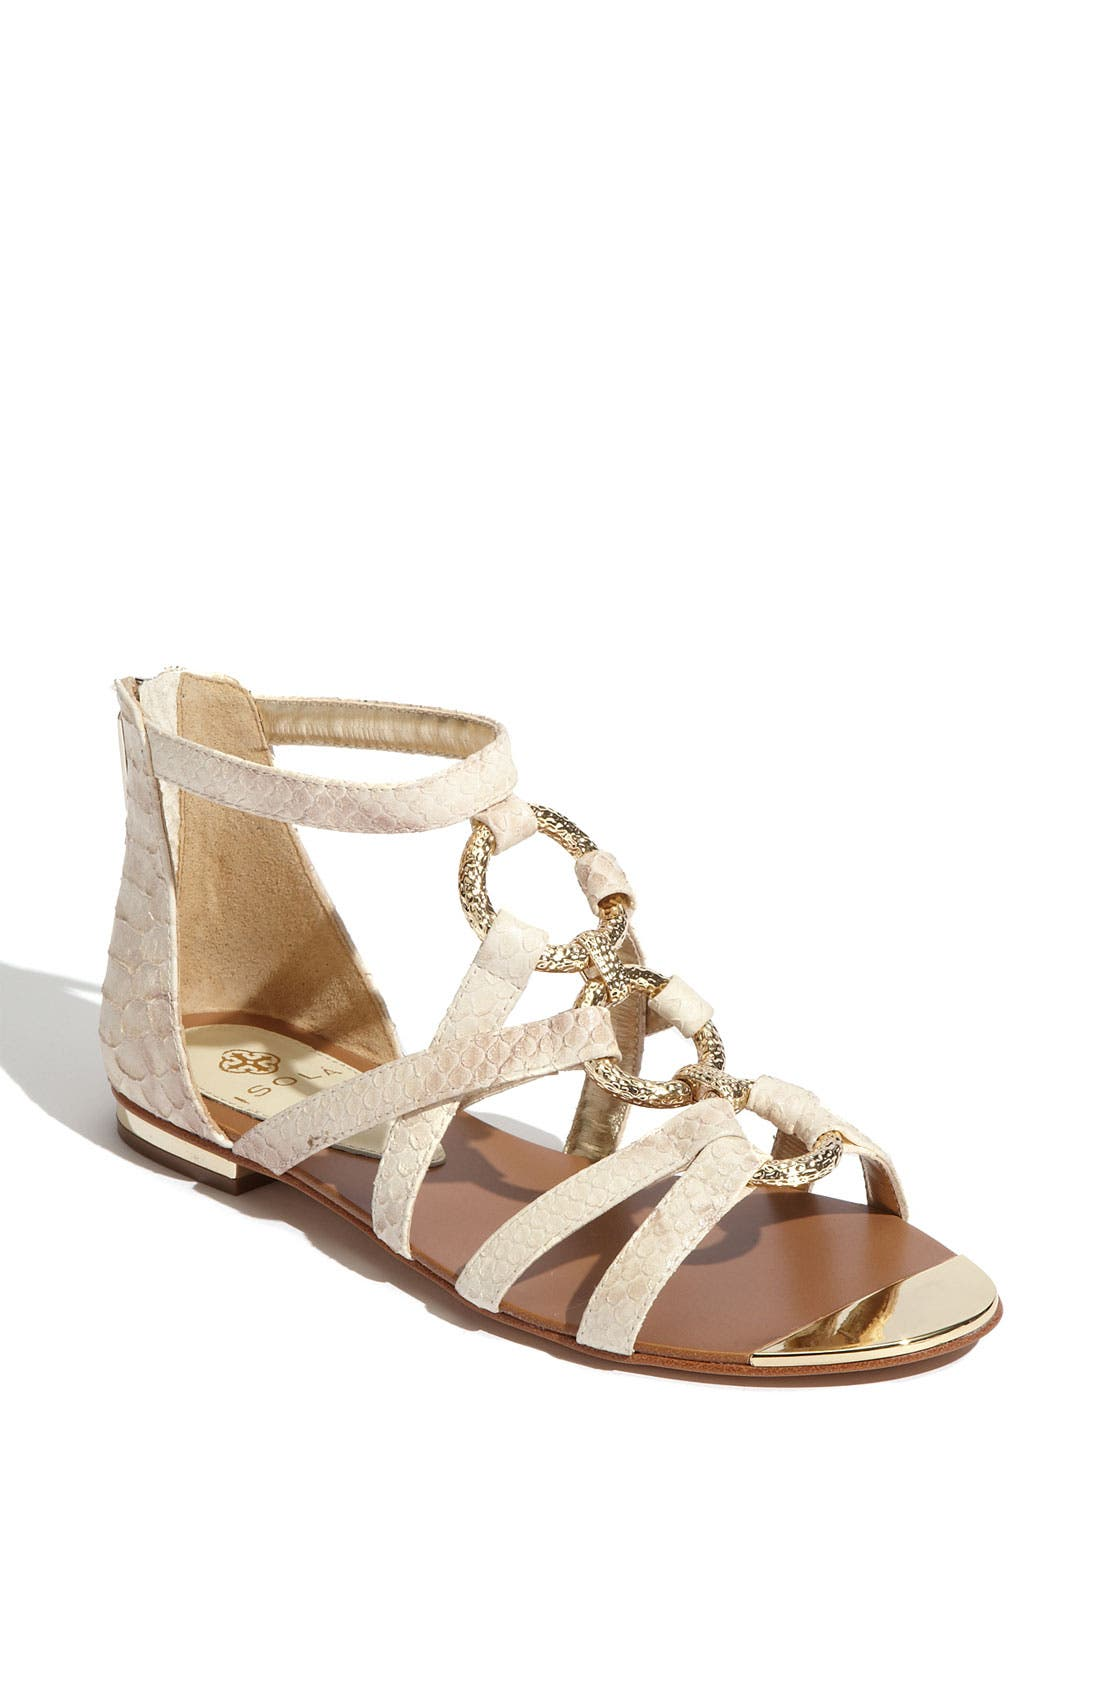 Alternate Image 1 Selected - Isolá 'Adriel' Flat Sandal